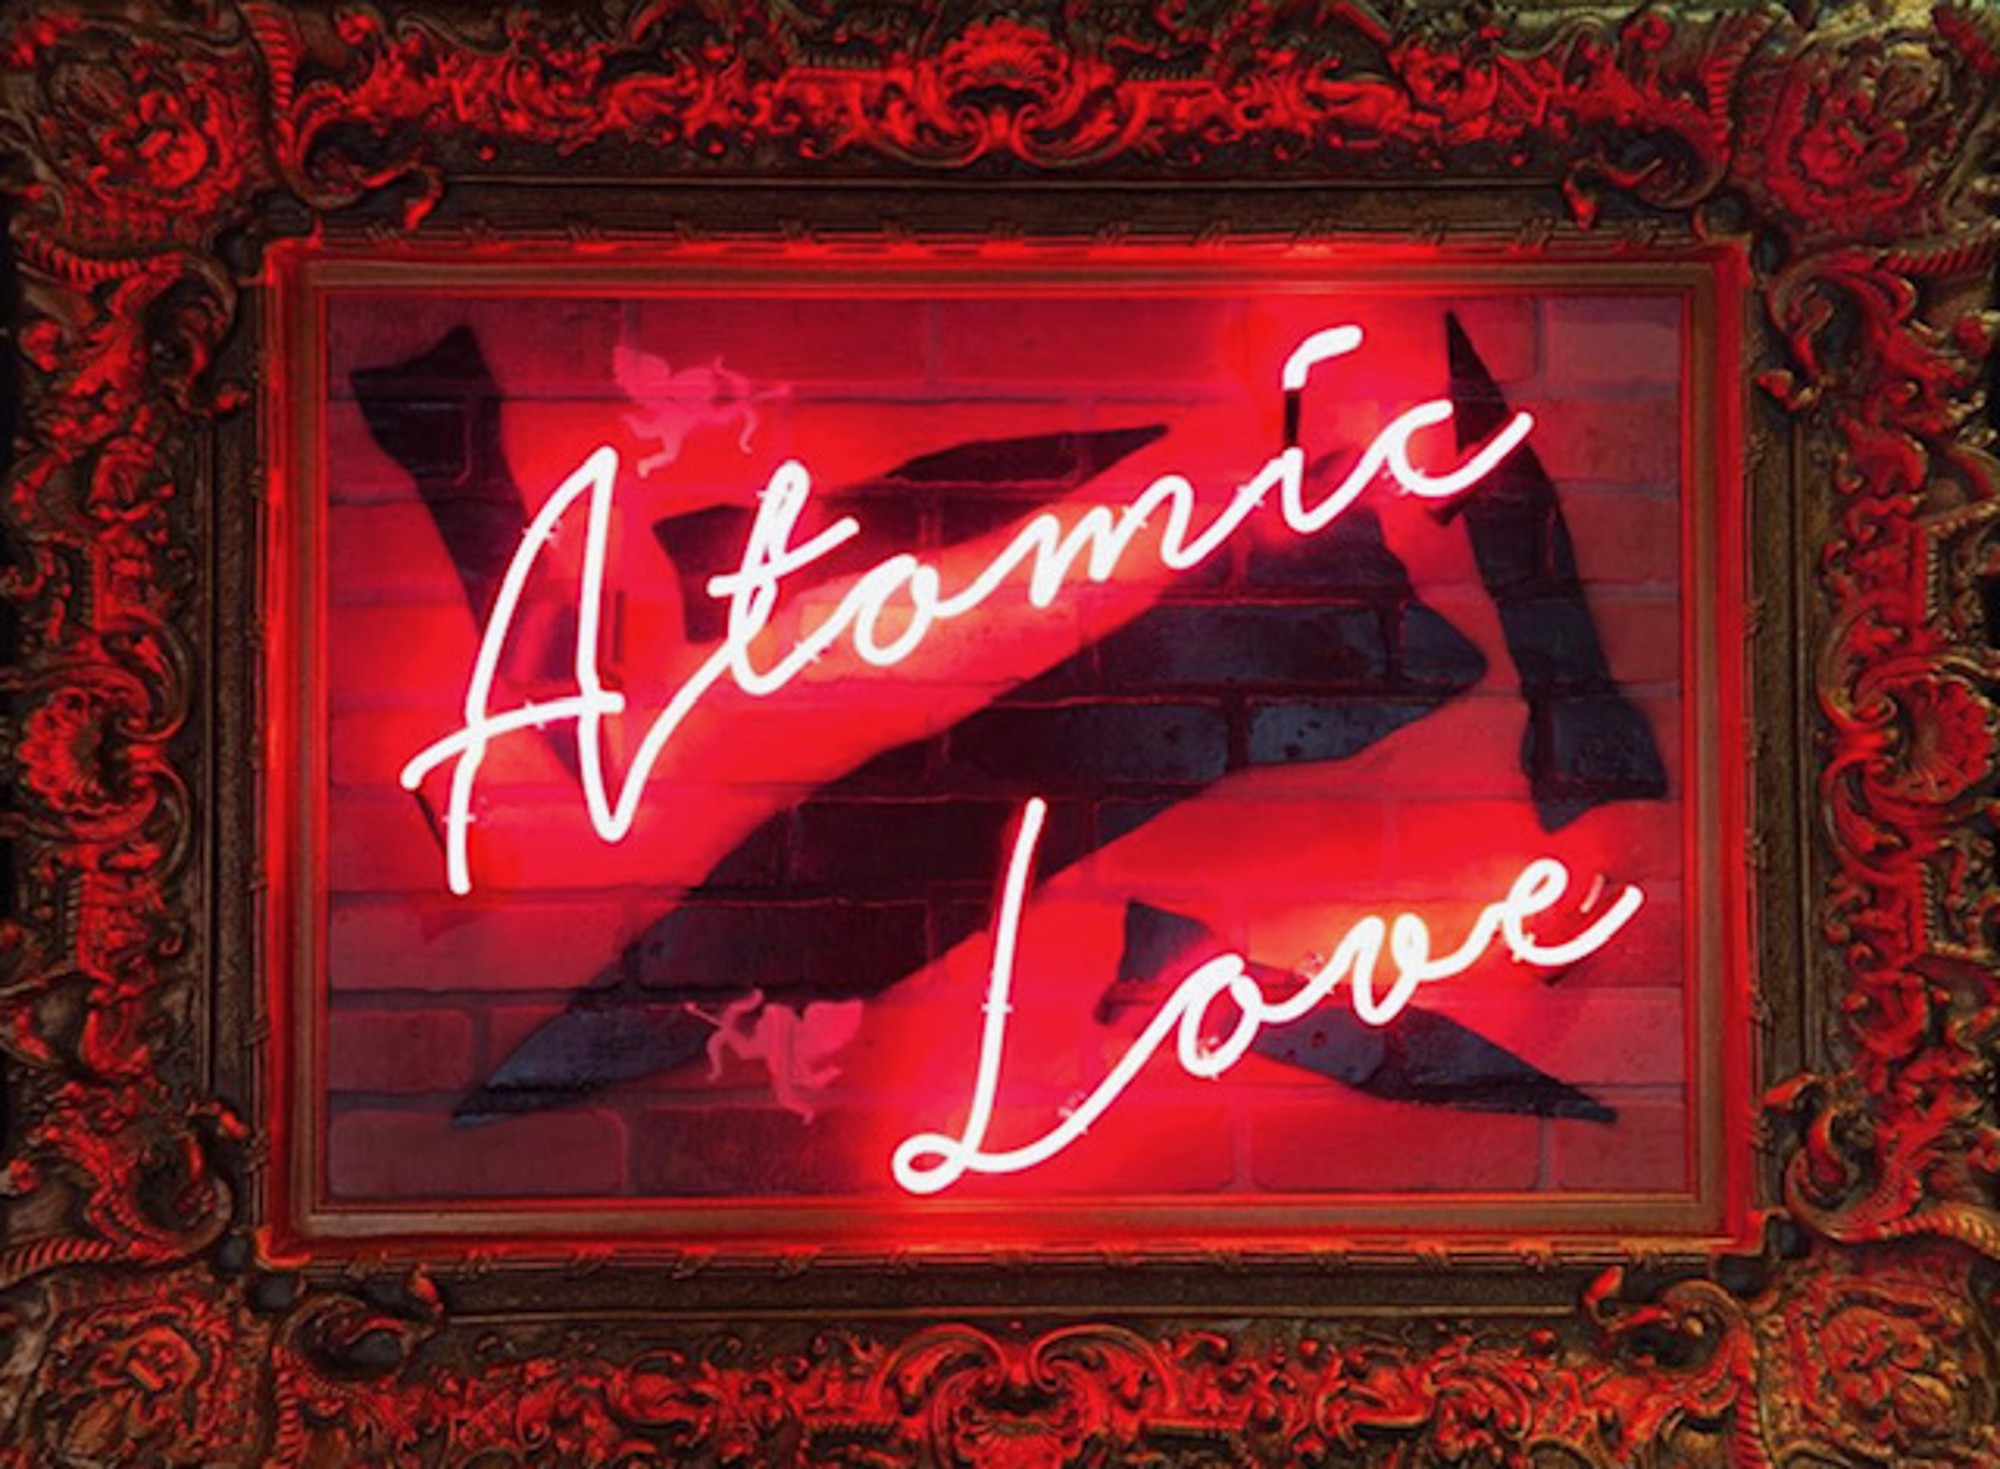 Atomic Love by Behind Pink Walls